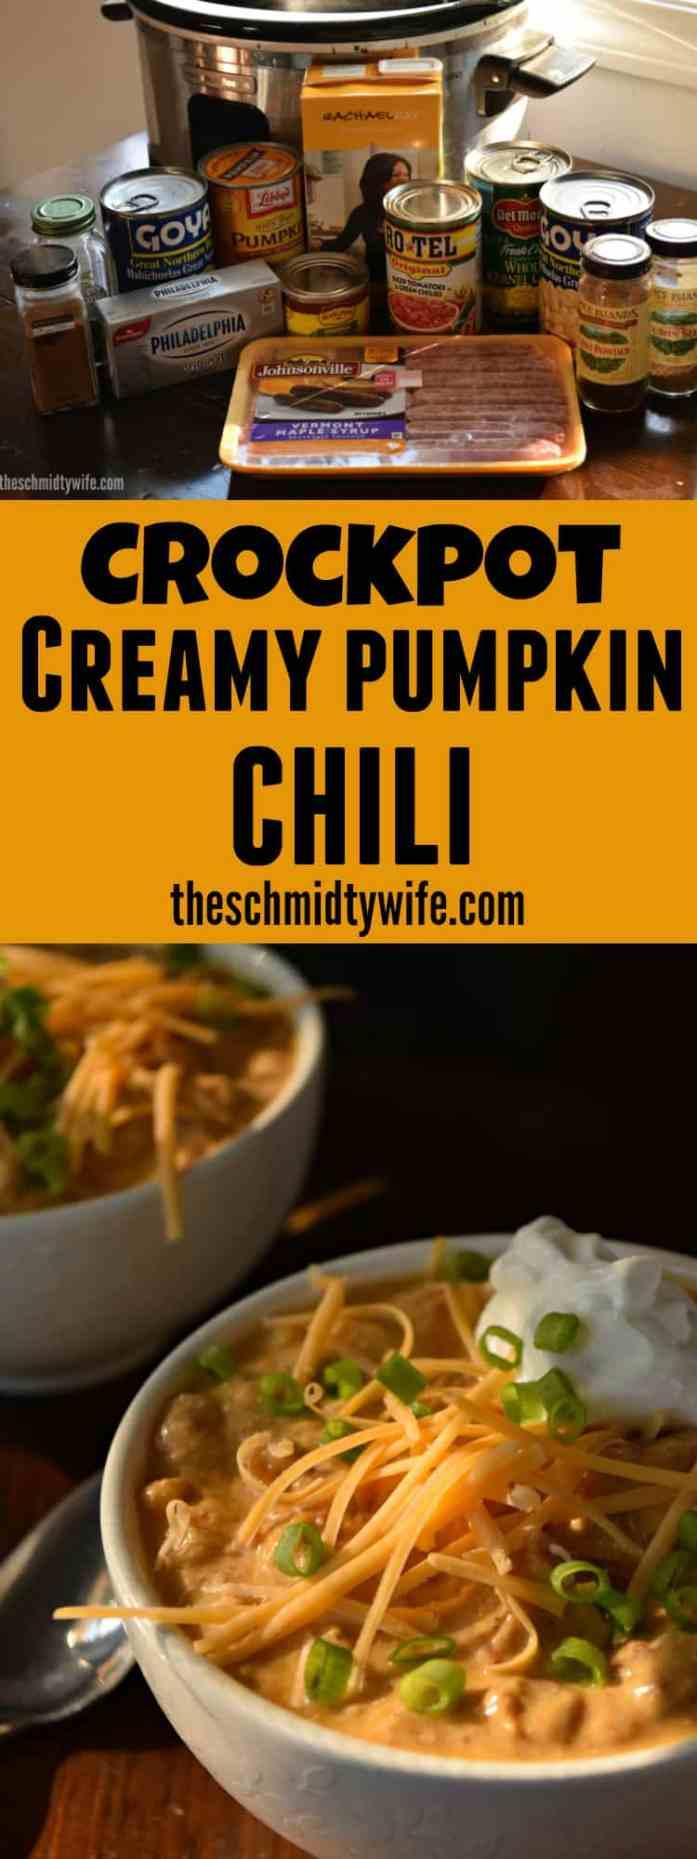 Crockpot Creamy Pumpkin Chili